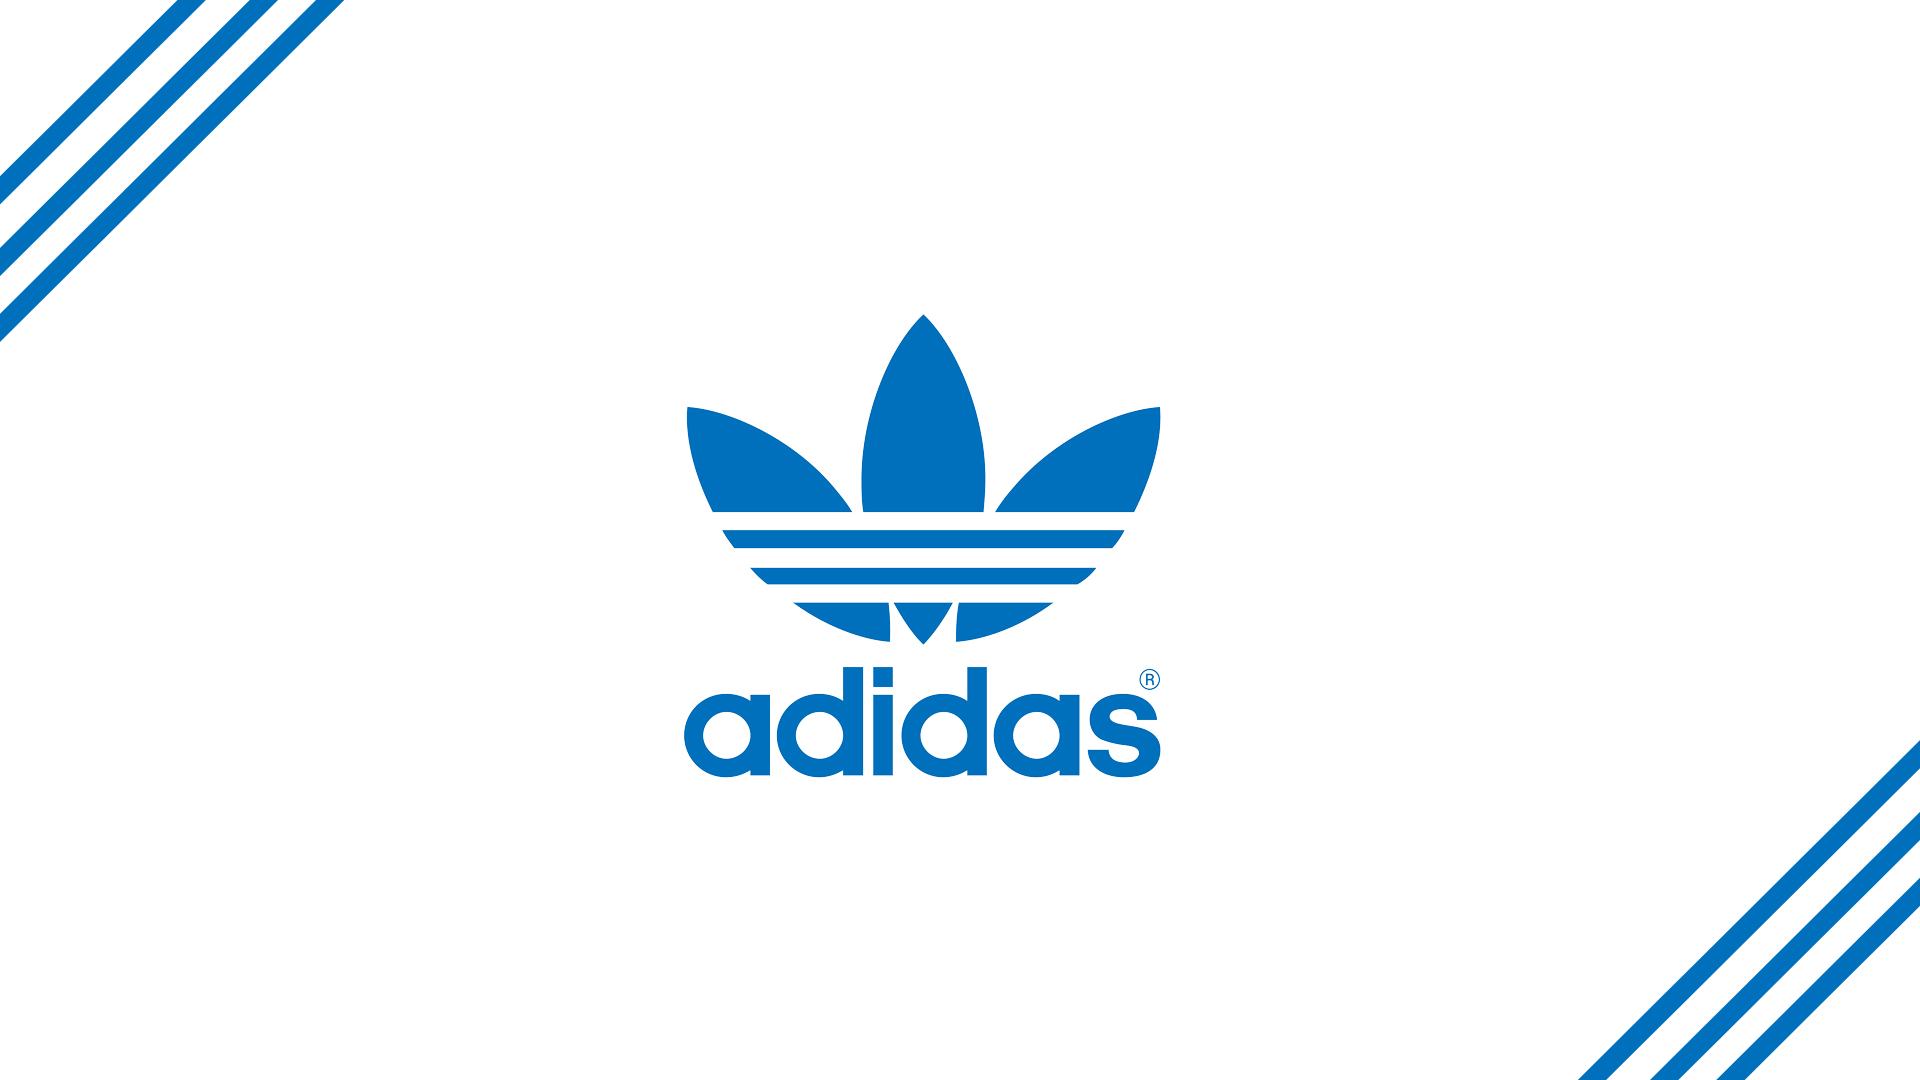 adidas wallpaper 8917